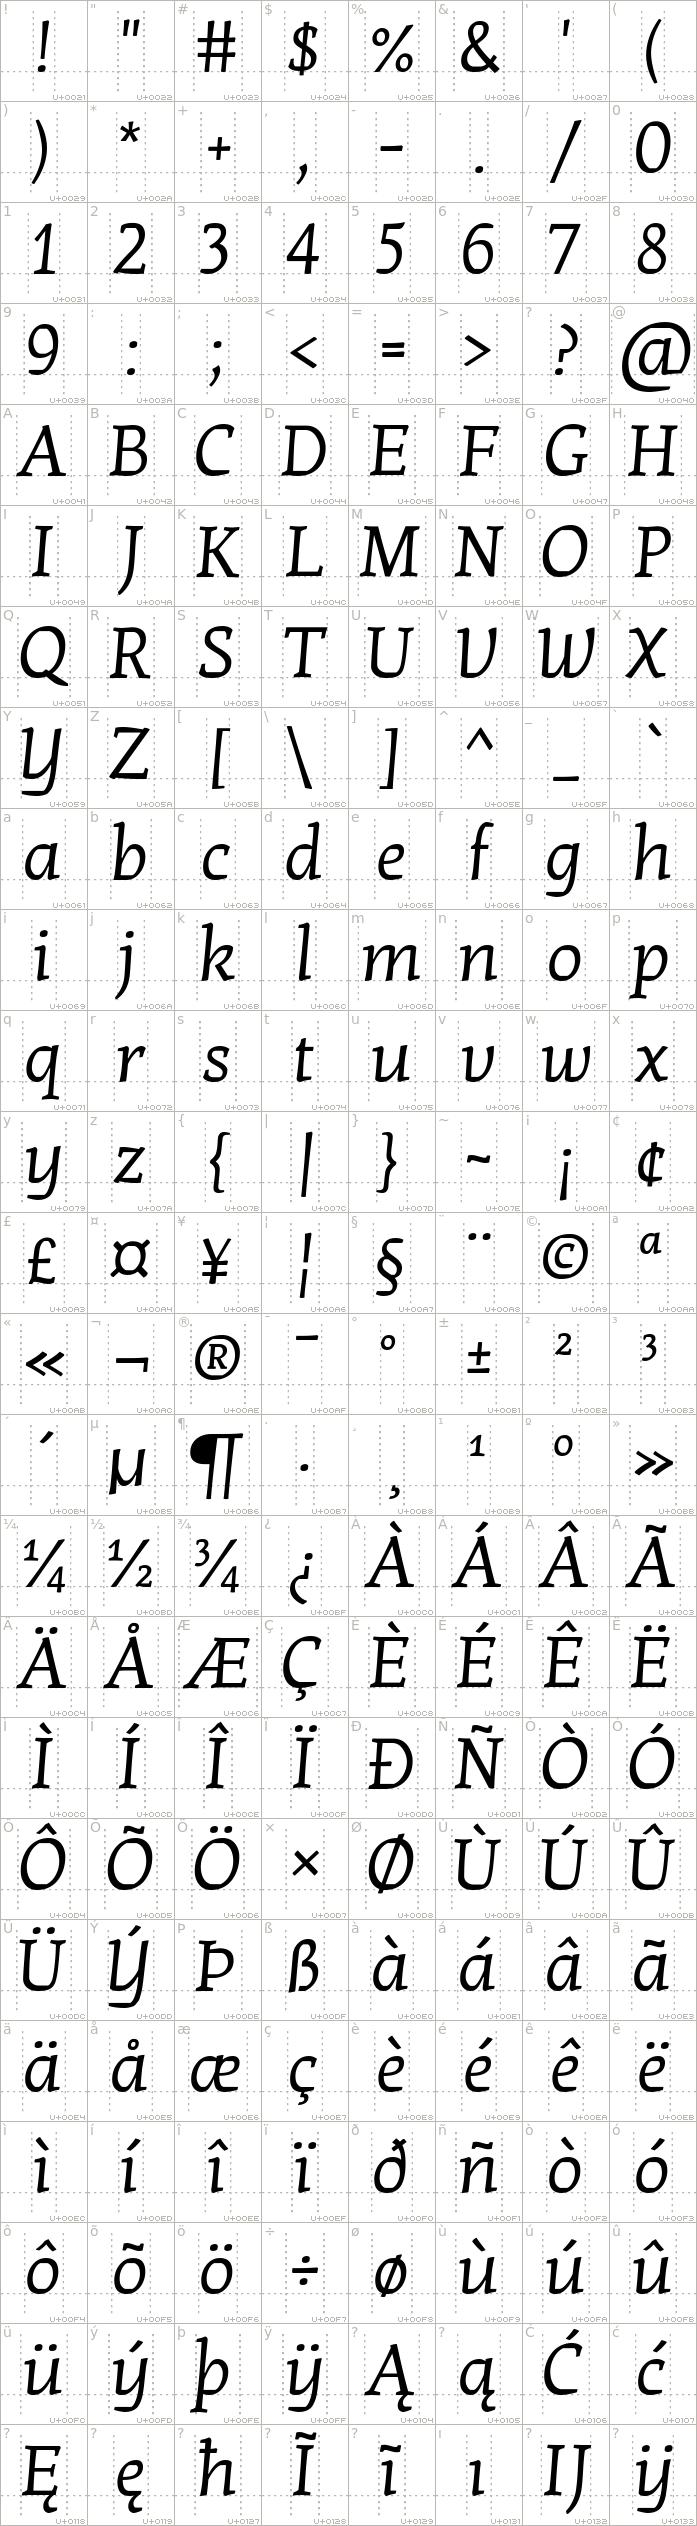 kotta-one.regular.character-map-1